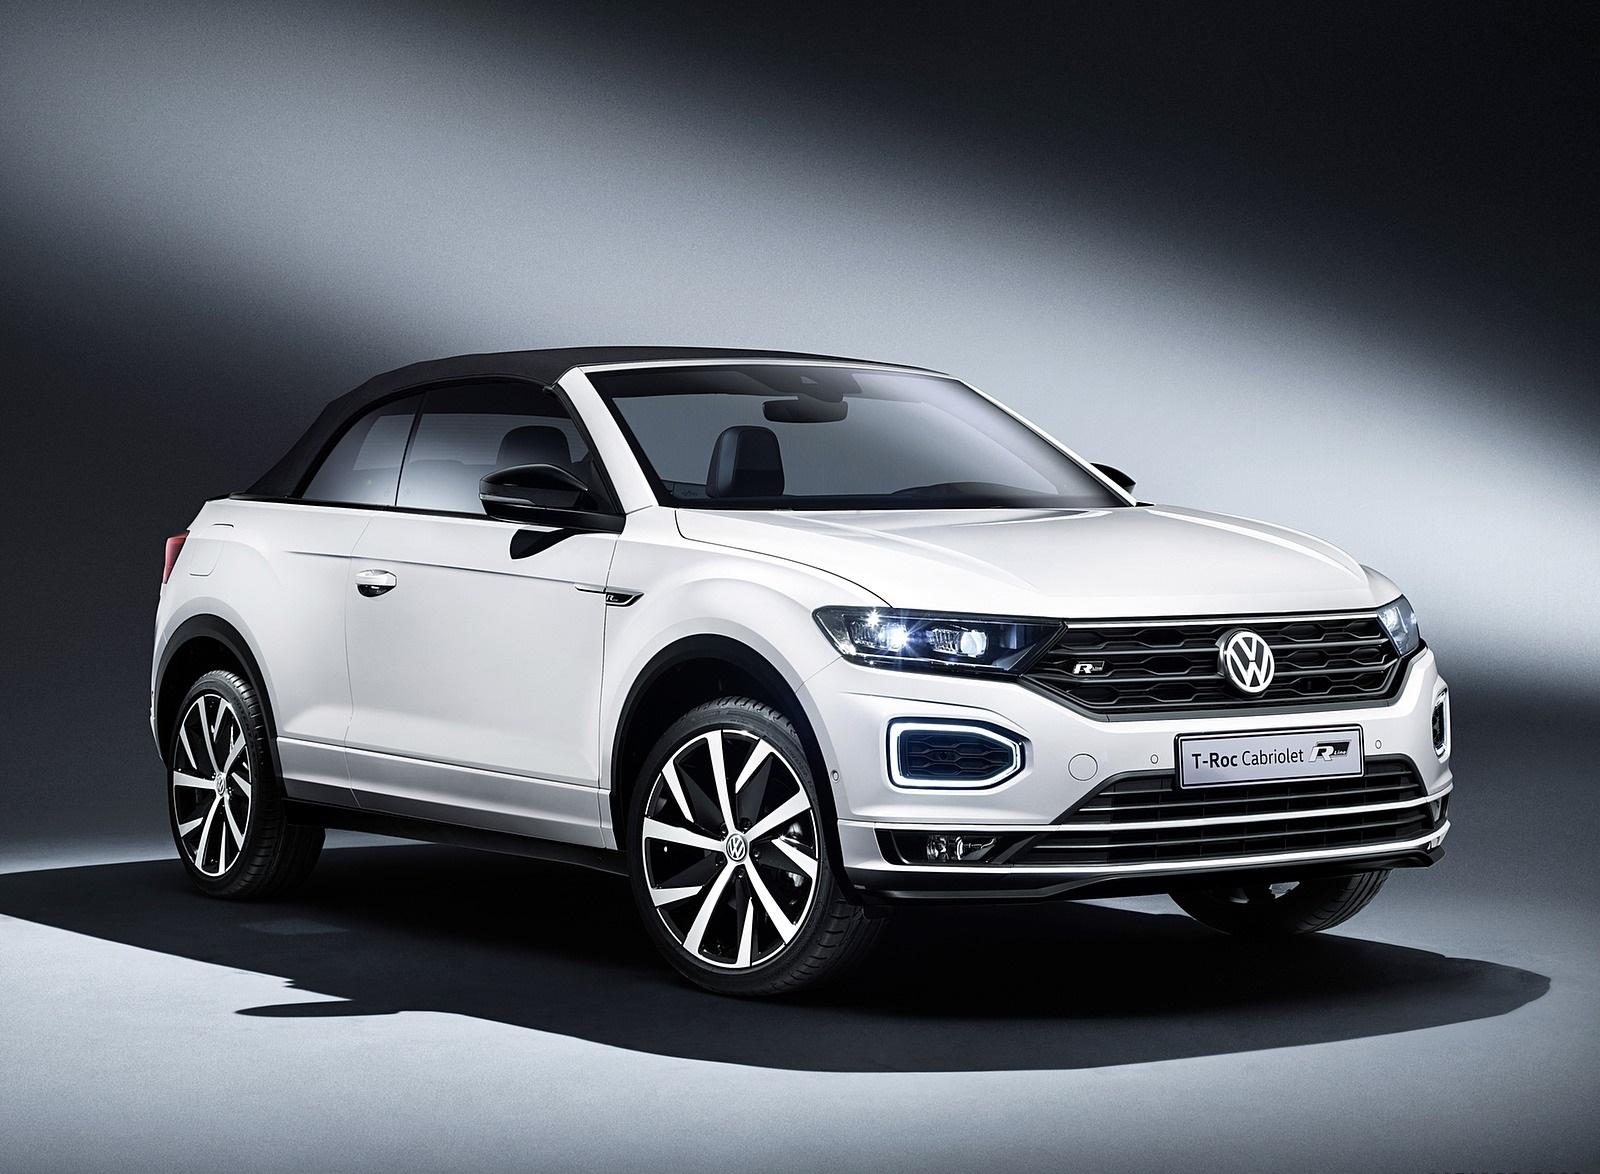 2020 Volkswagen T-Roc Cabriolet Front Three-Quarter Wallpapers (7)